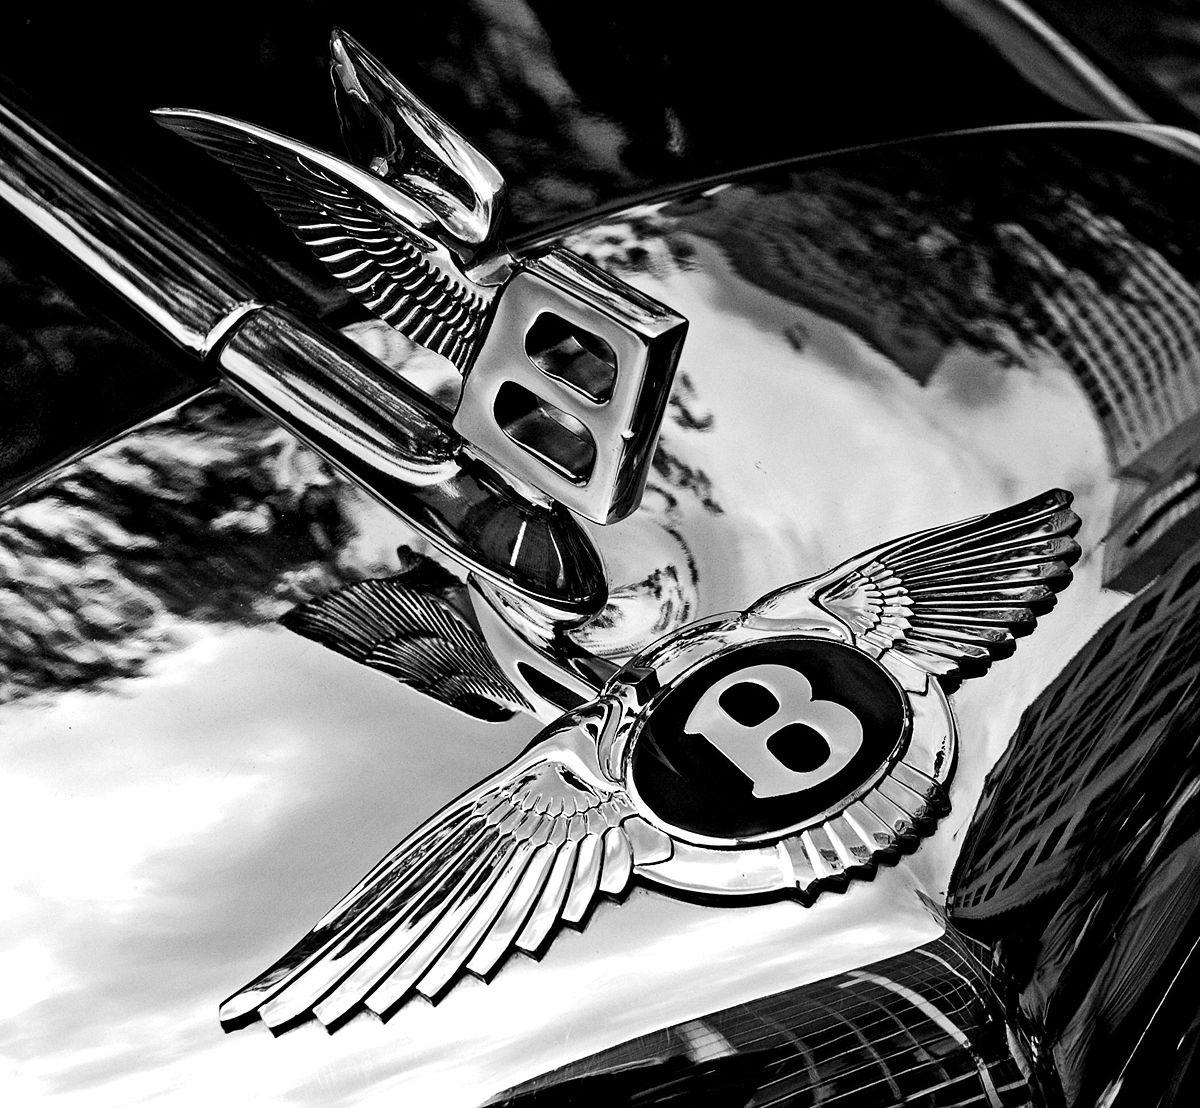 the-flying-B-symbol-of-Bentley